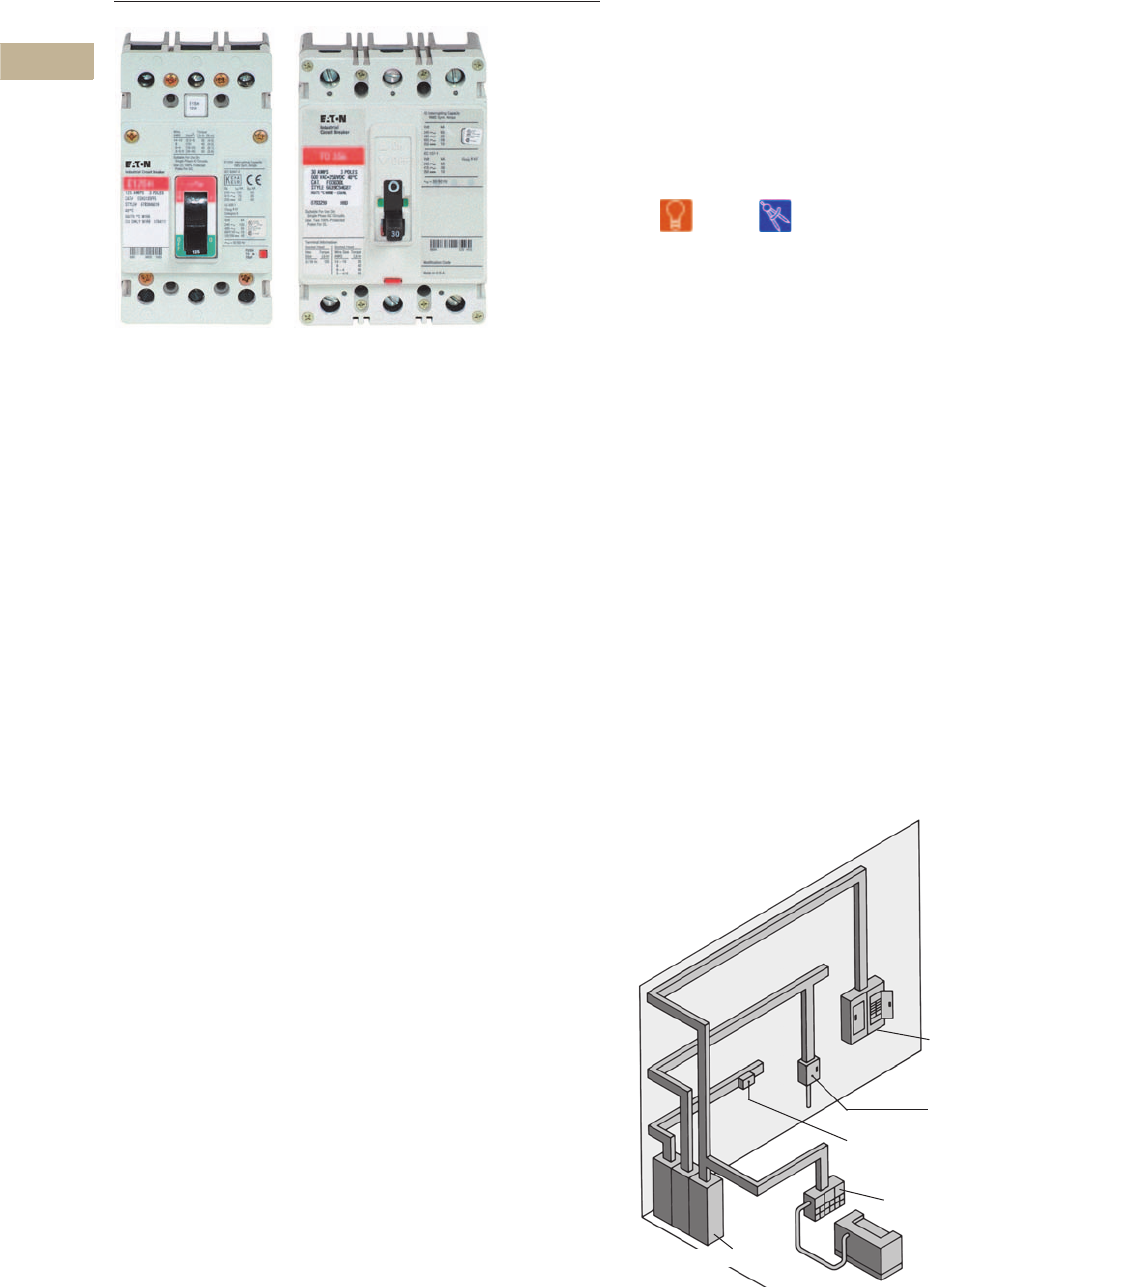 Volume 4 Tab 2 76301 Catalog Circuit Breaker Used Cutler Hammer Ed3150 150 Amp V4 T2 4circuit Protection Ca08100005ejune 2014 Eatoncom